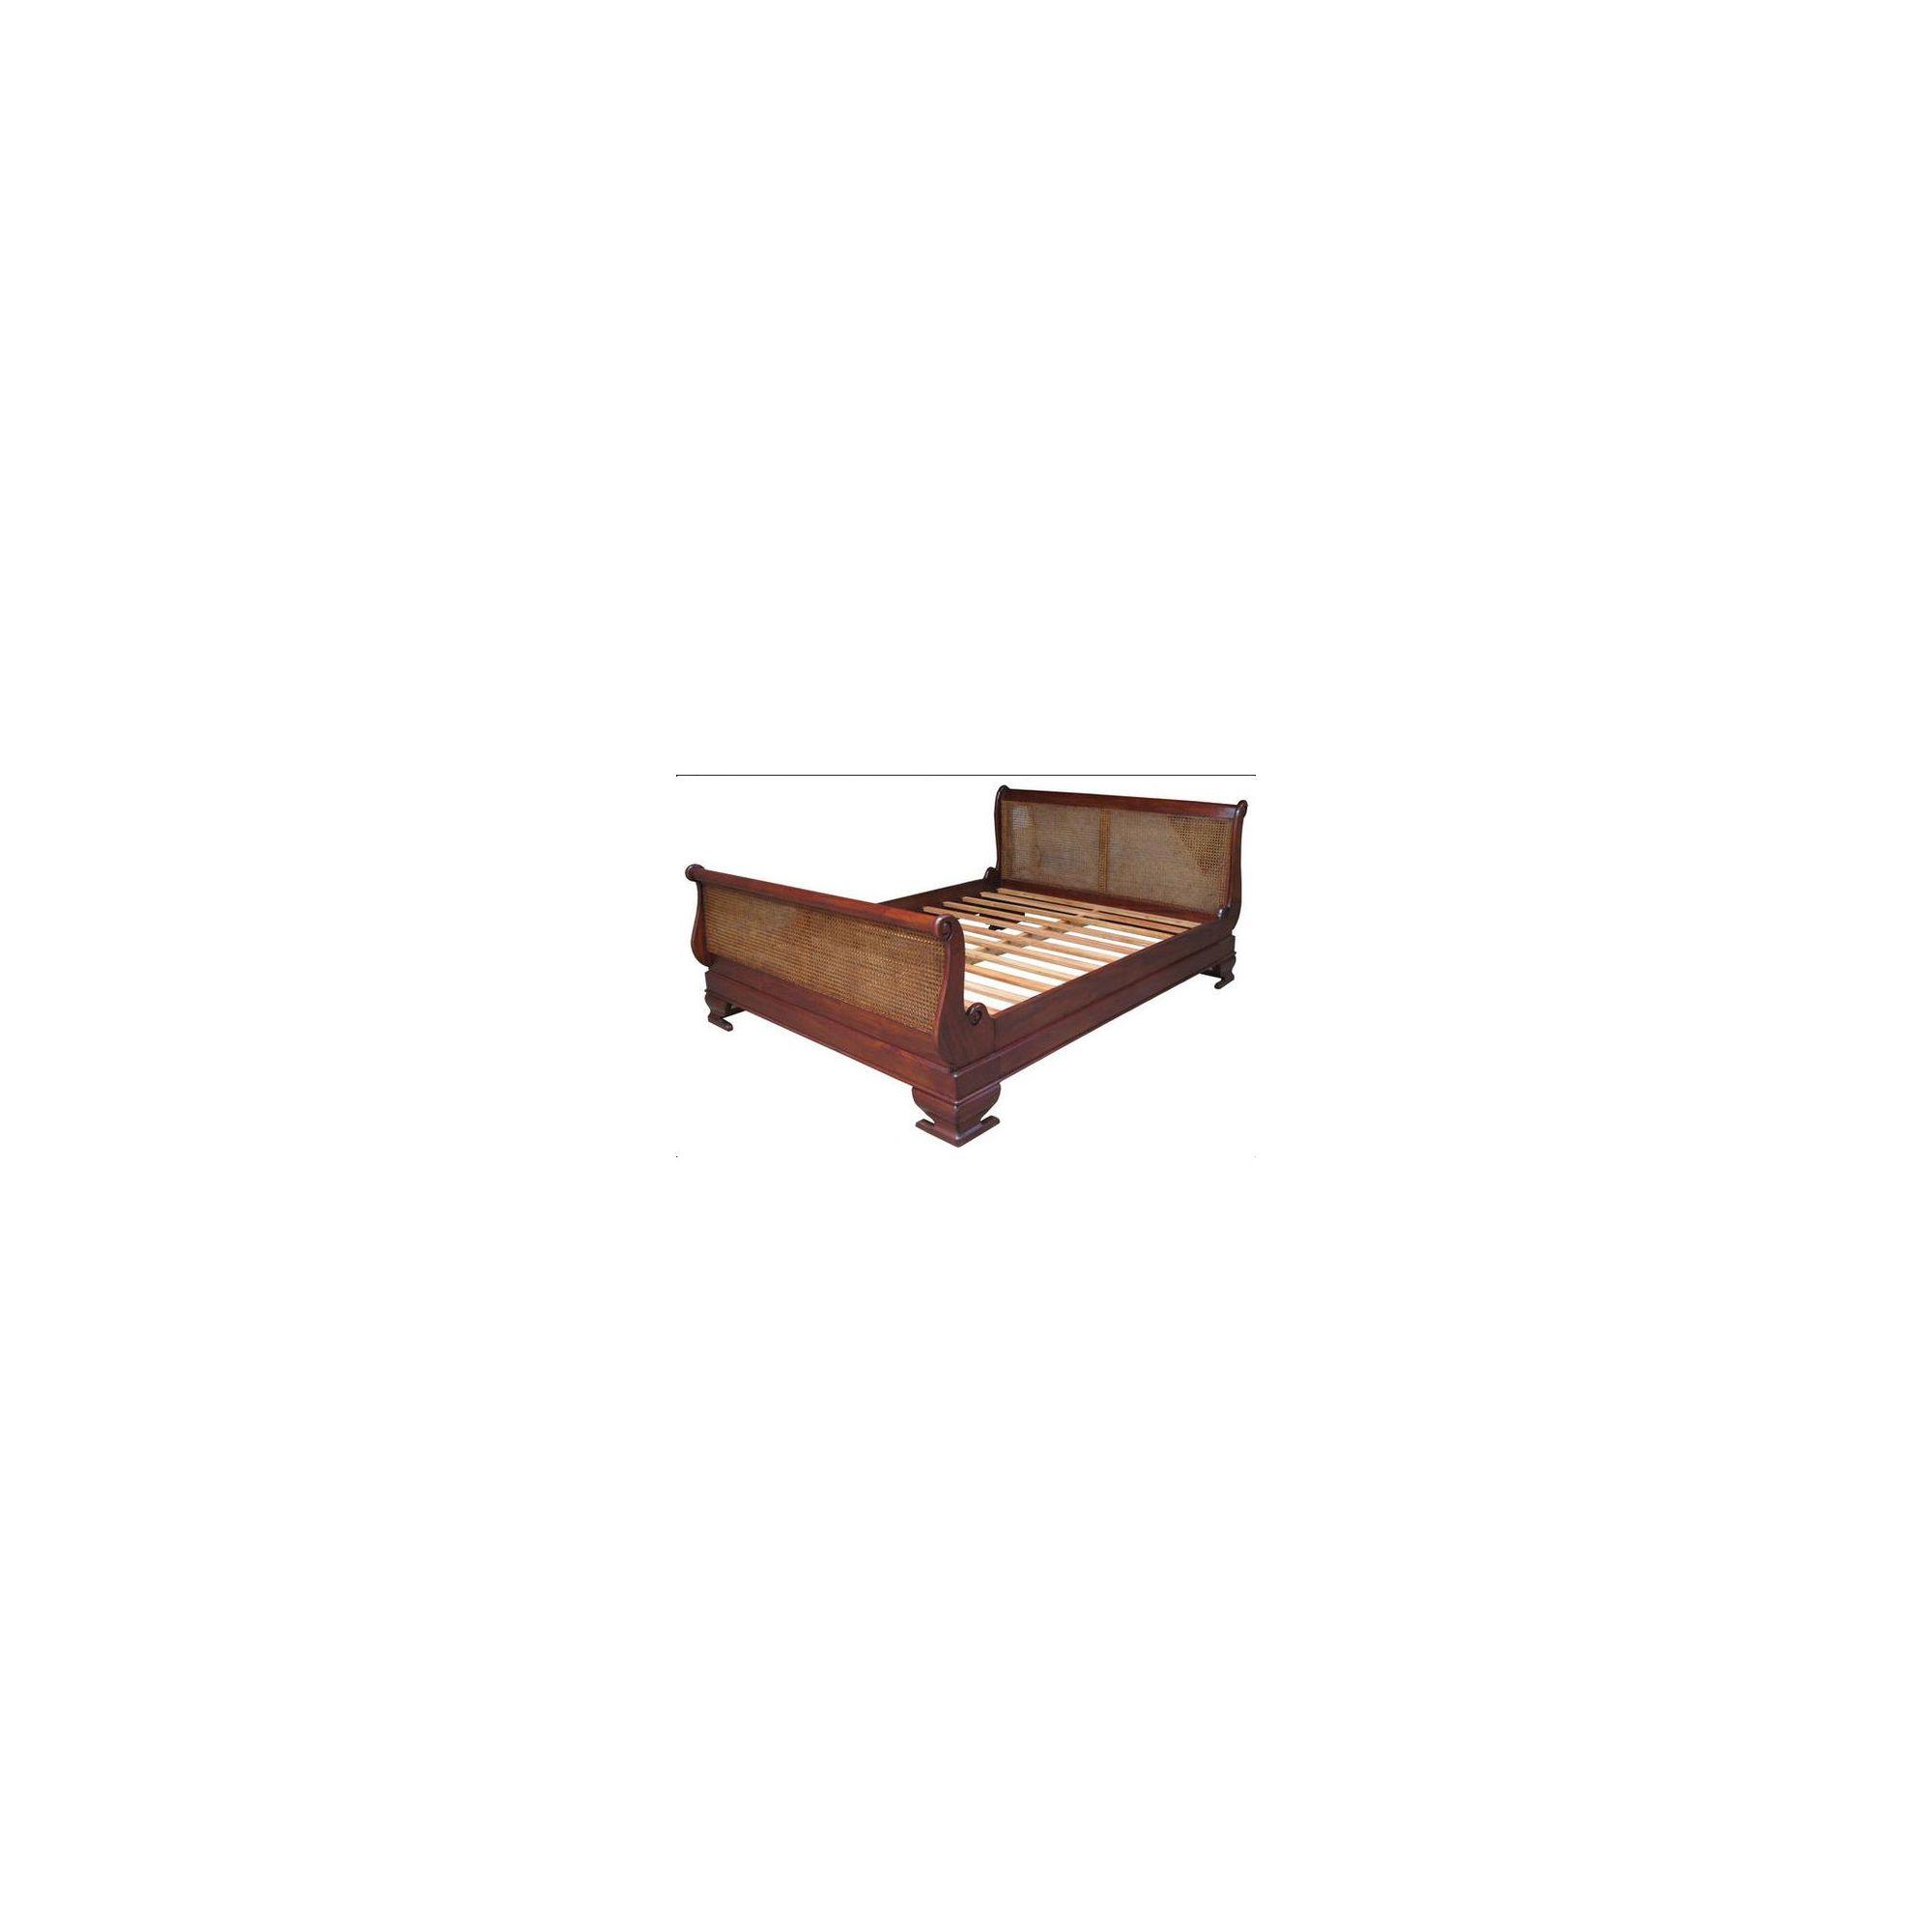 Lock stock and barrel Mahogany Rattan Sleigh Bed in Mahogany - Wax - King at Tesco Direct